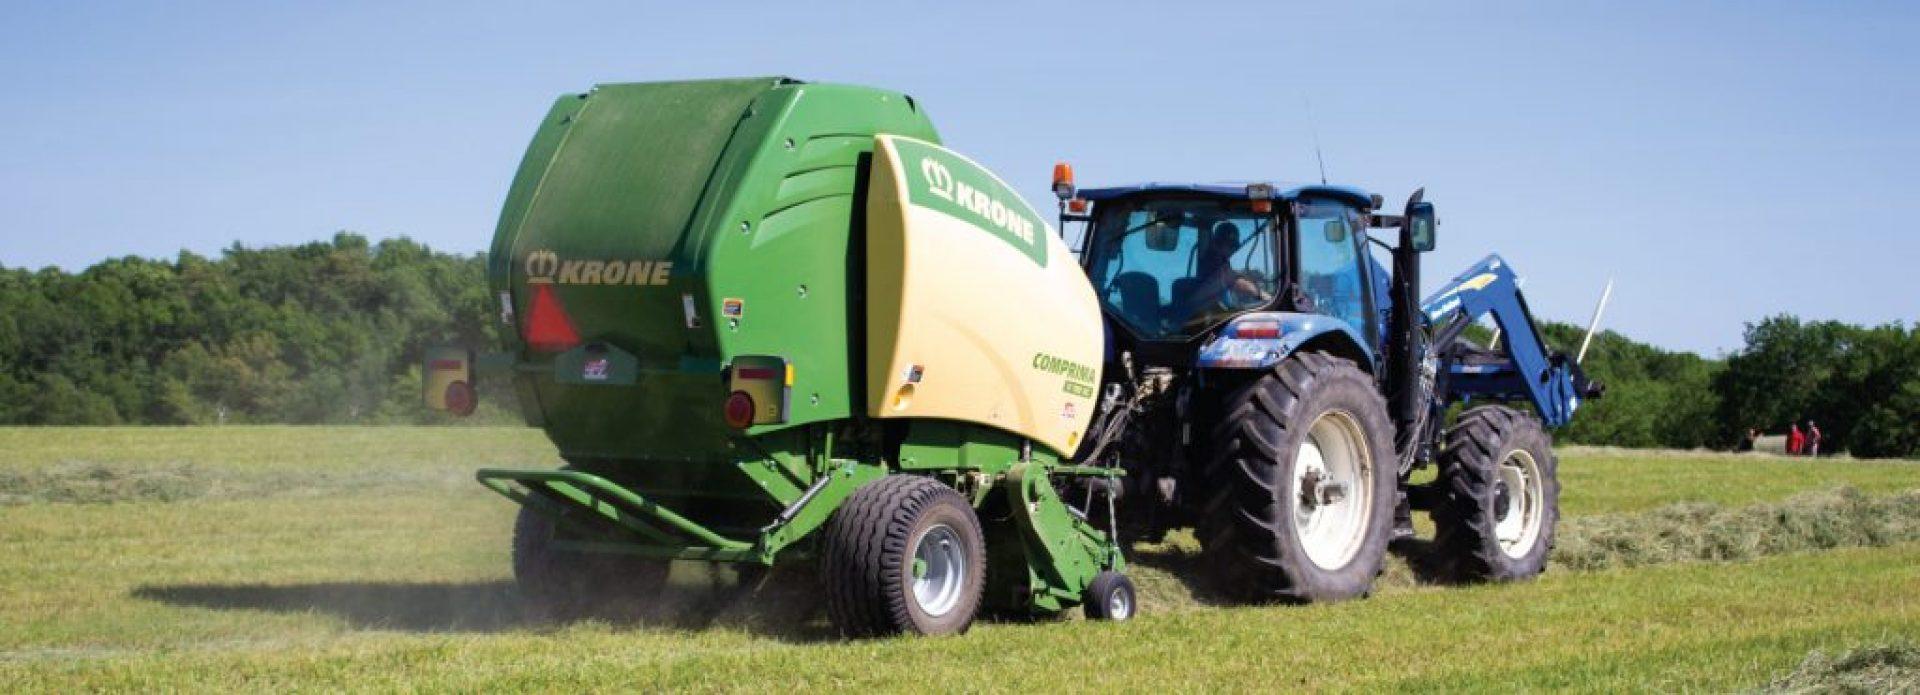 Eldon-C-Stutsman-Inc-Equipment-Krone-Comprima-V150XC